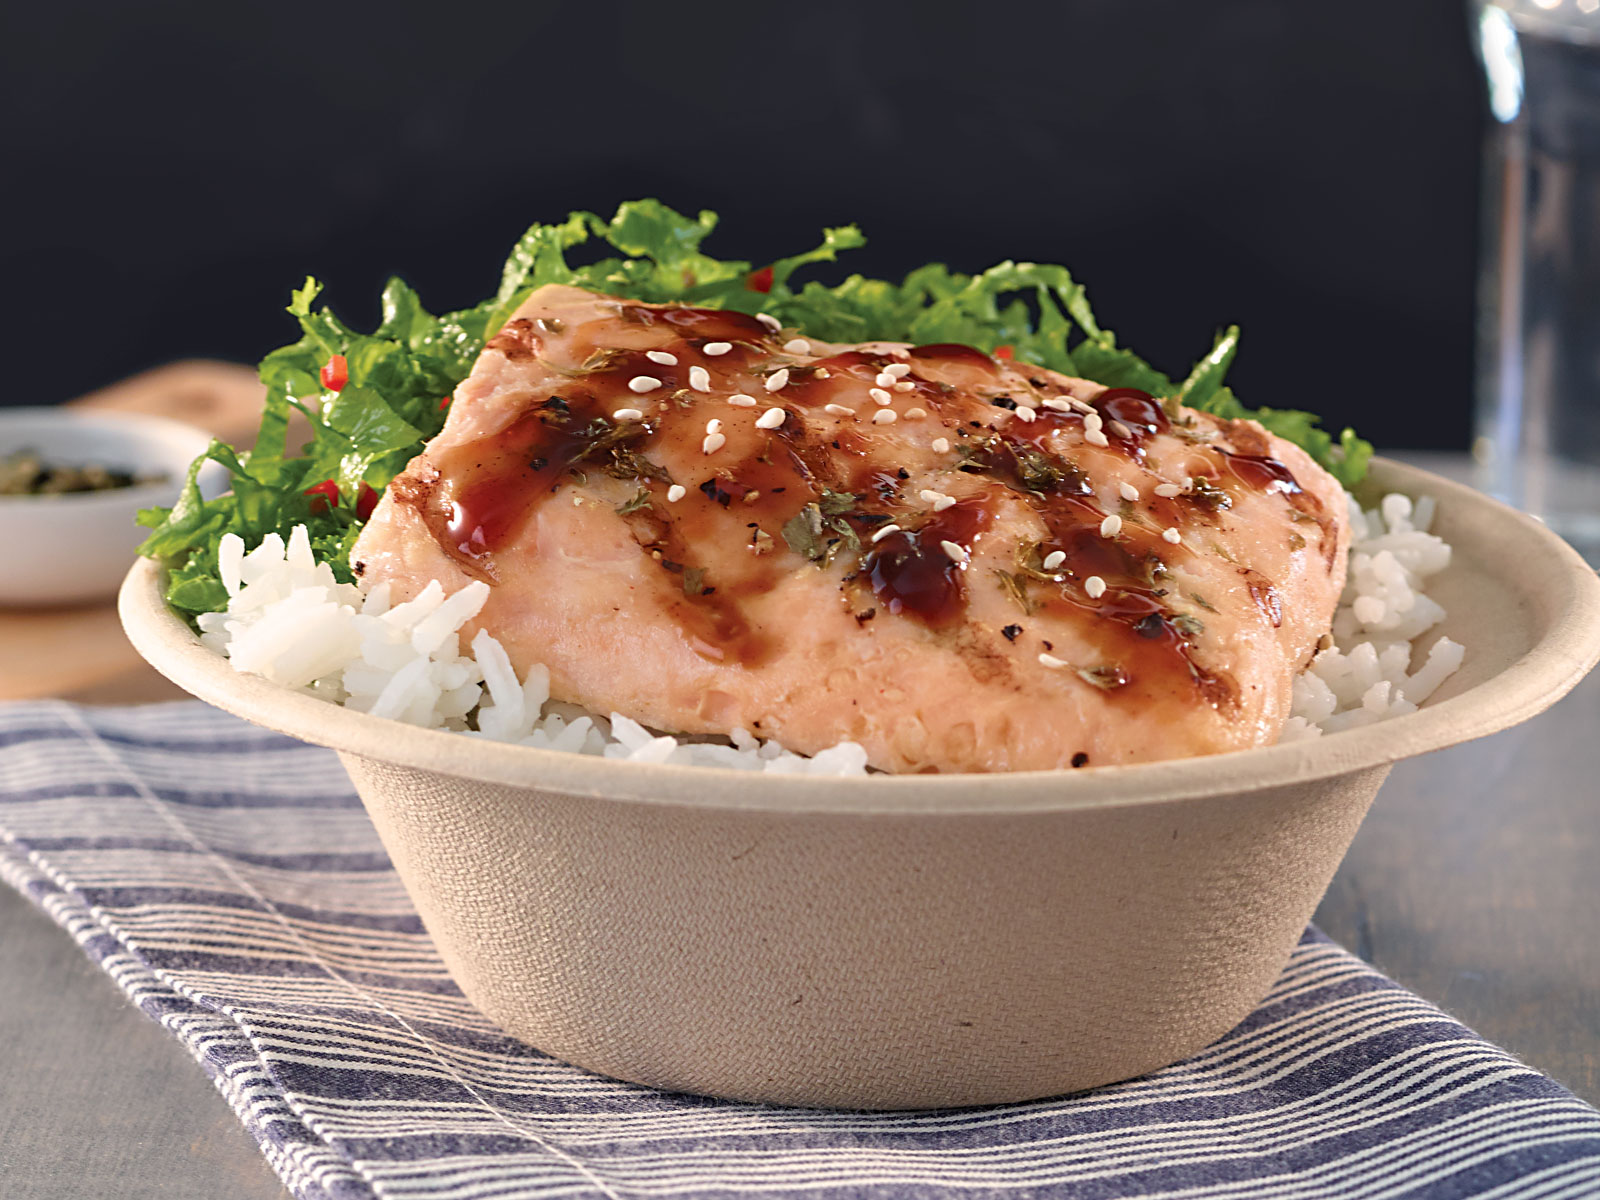 Redi Grilled™ Wild Alaska Salmon Bowl with Tonkatsu Sauce